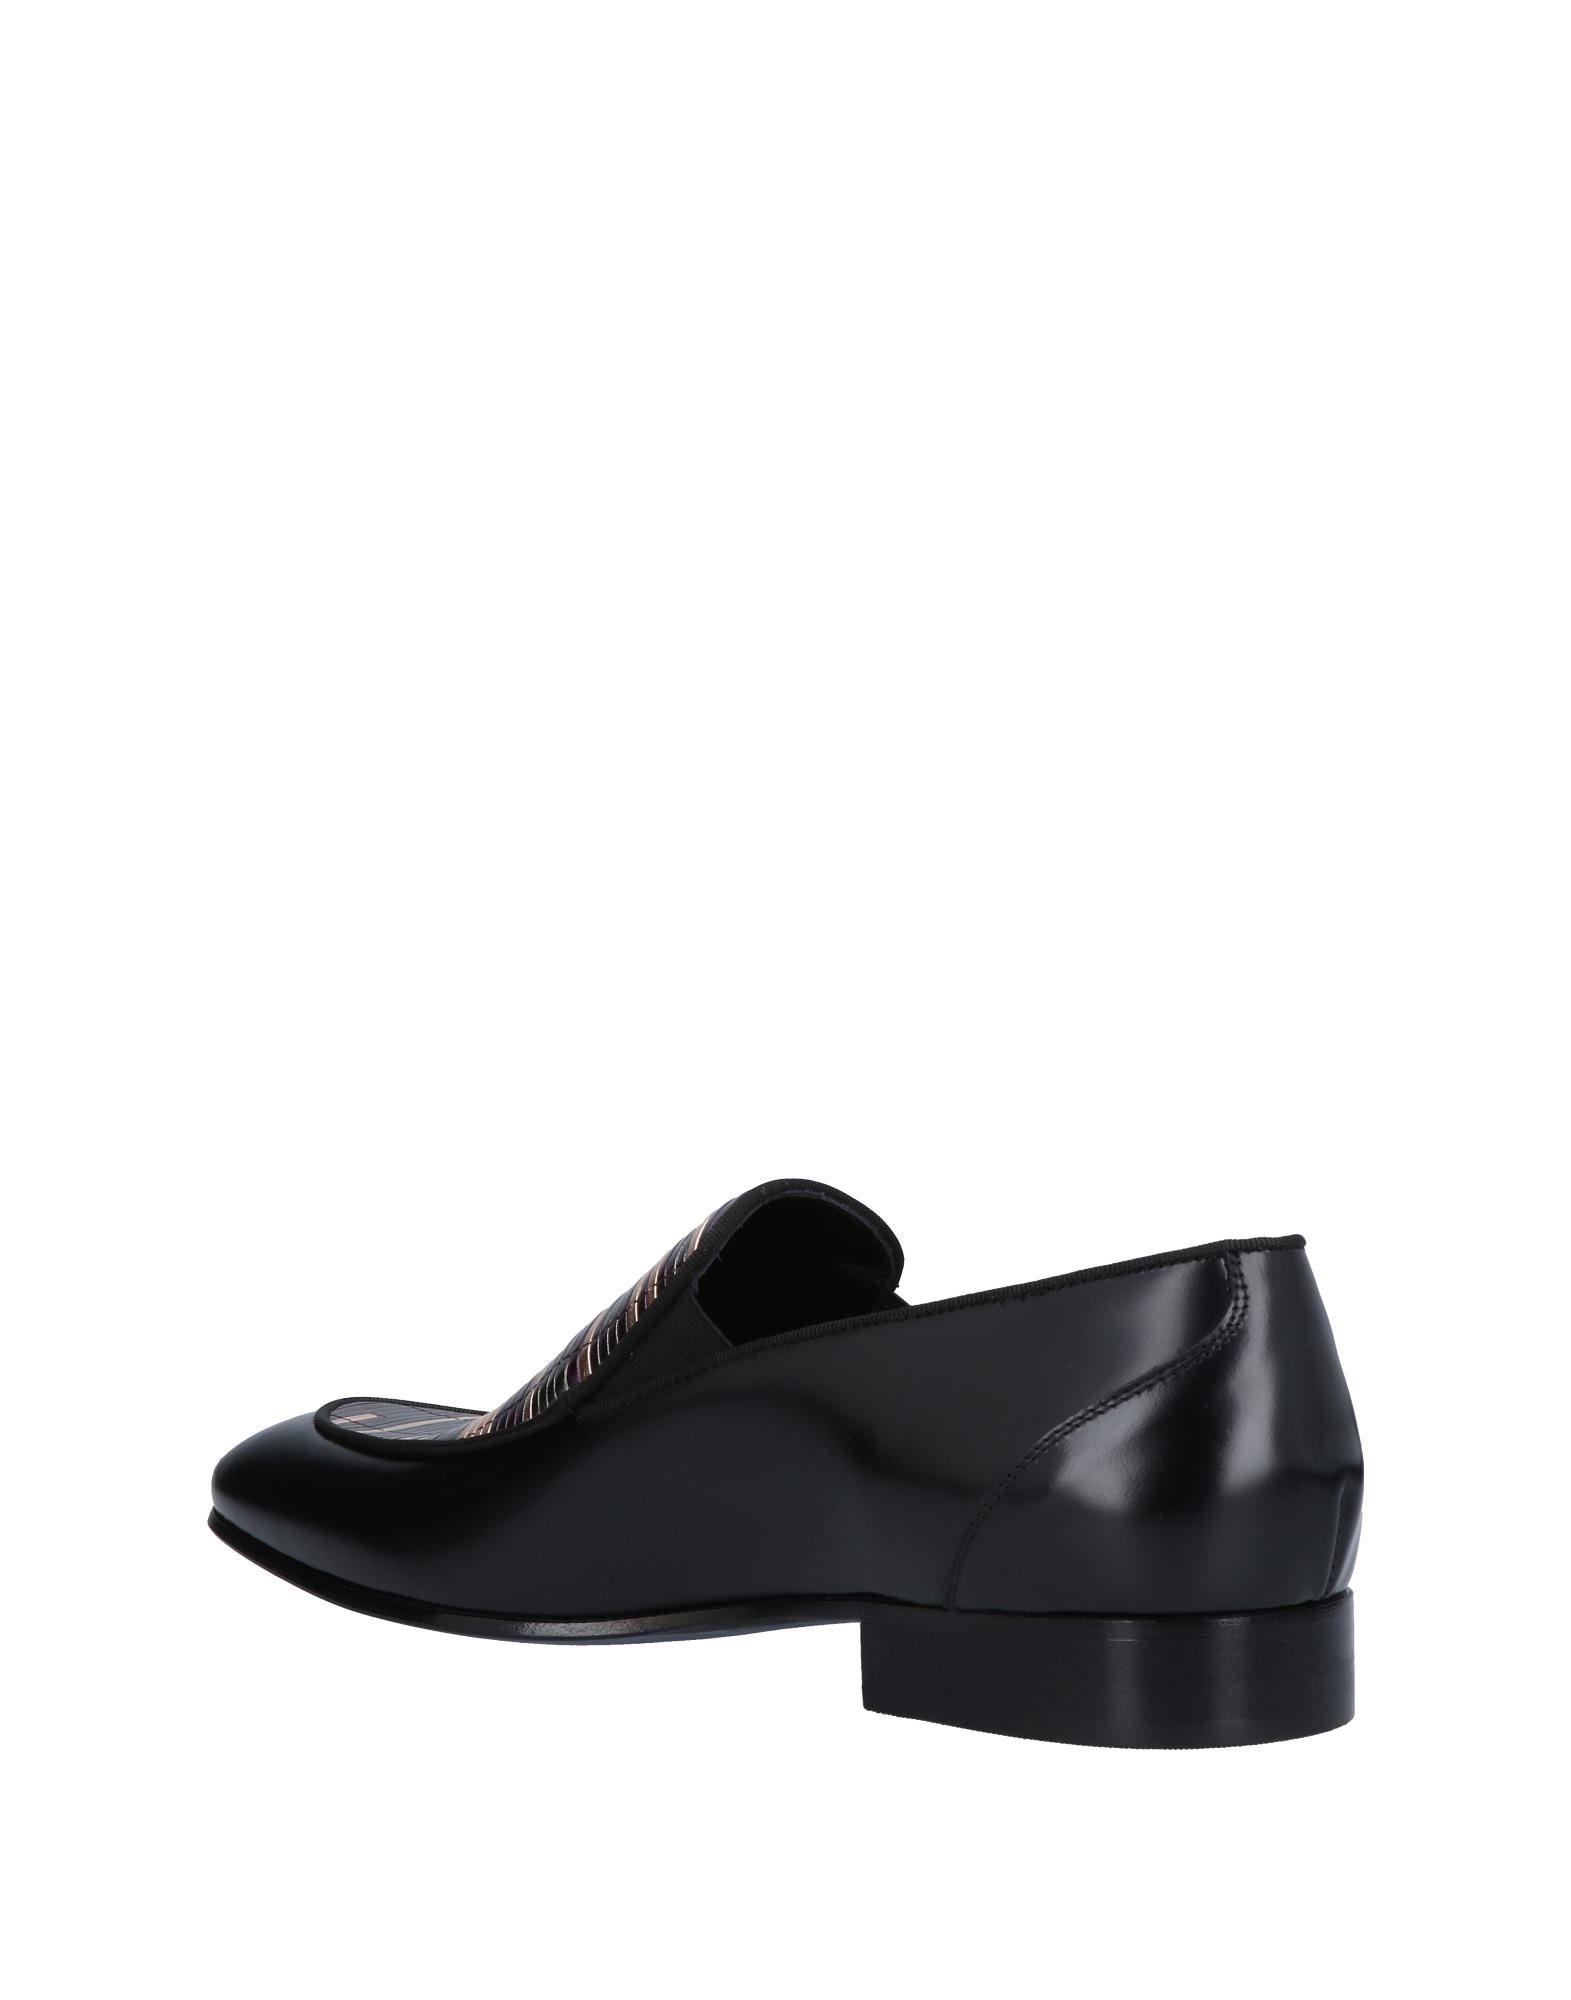 Giovanni Conti Gute Mokassins Herren  11471512WN Gute Conti Qualität beliebte Schuhe e58d1a